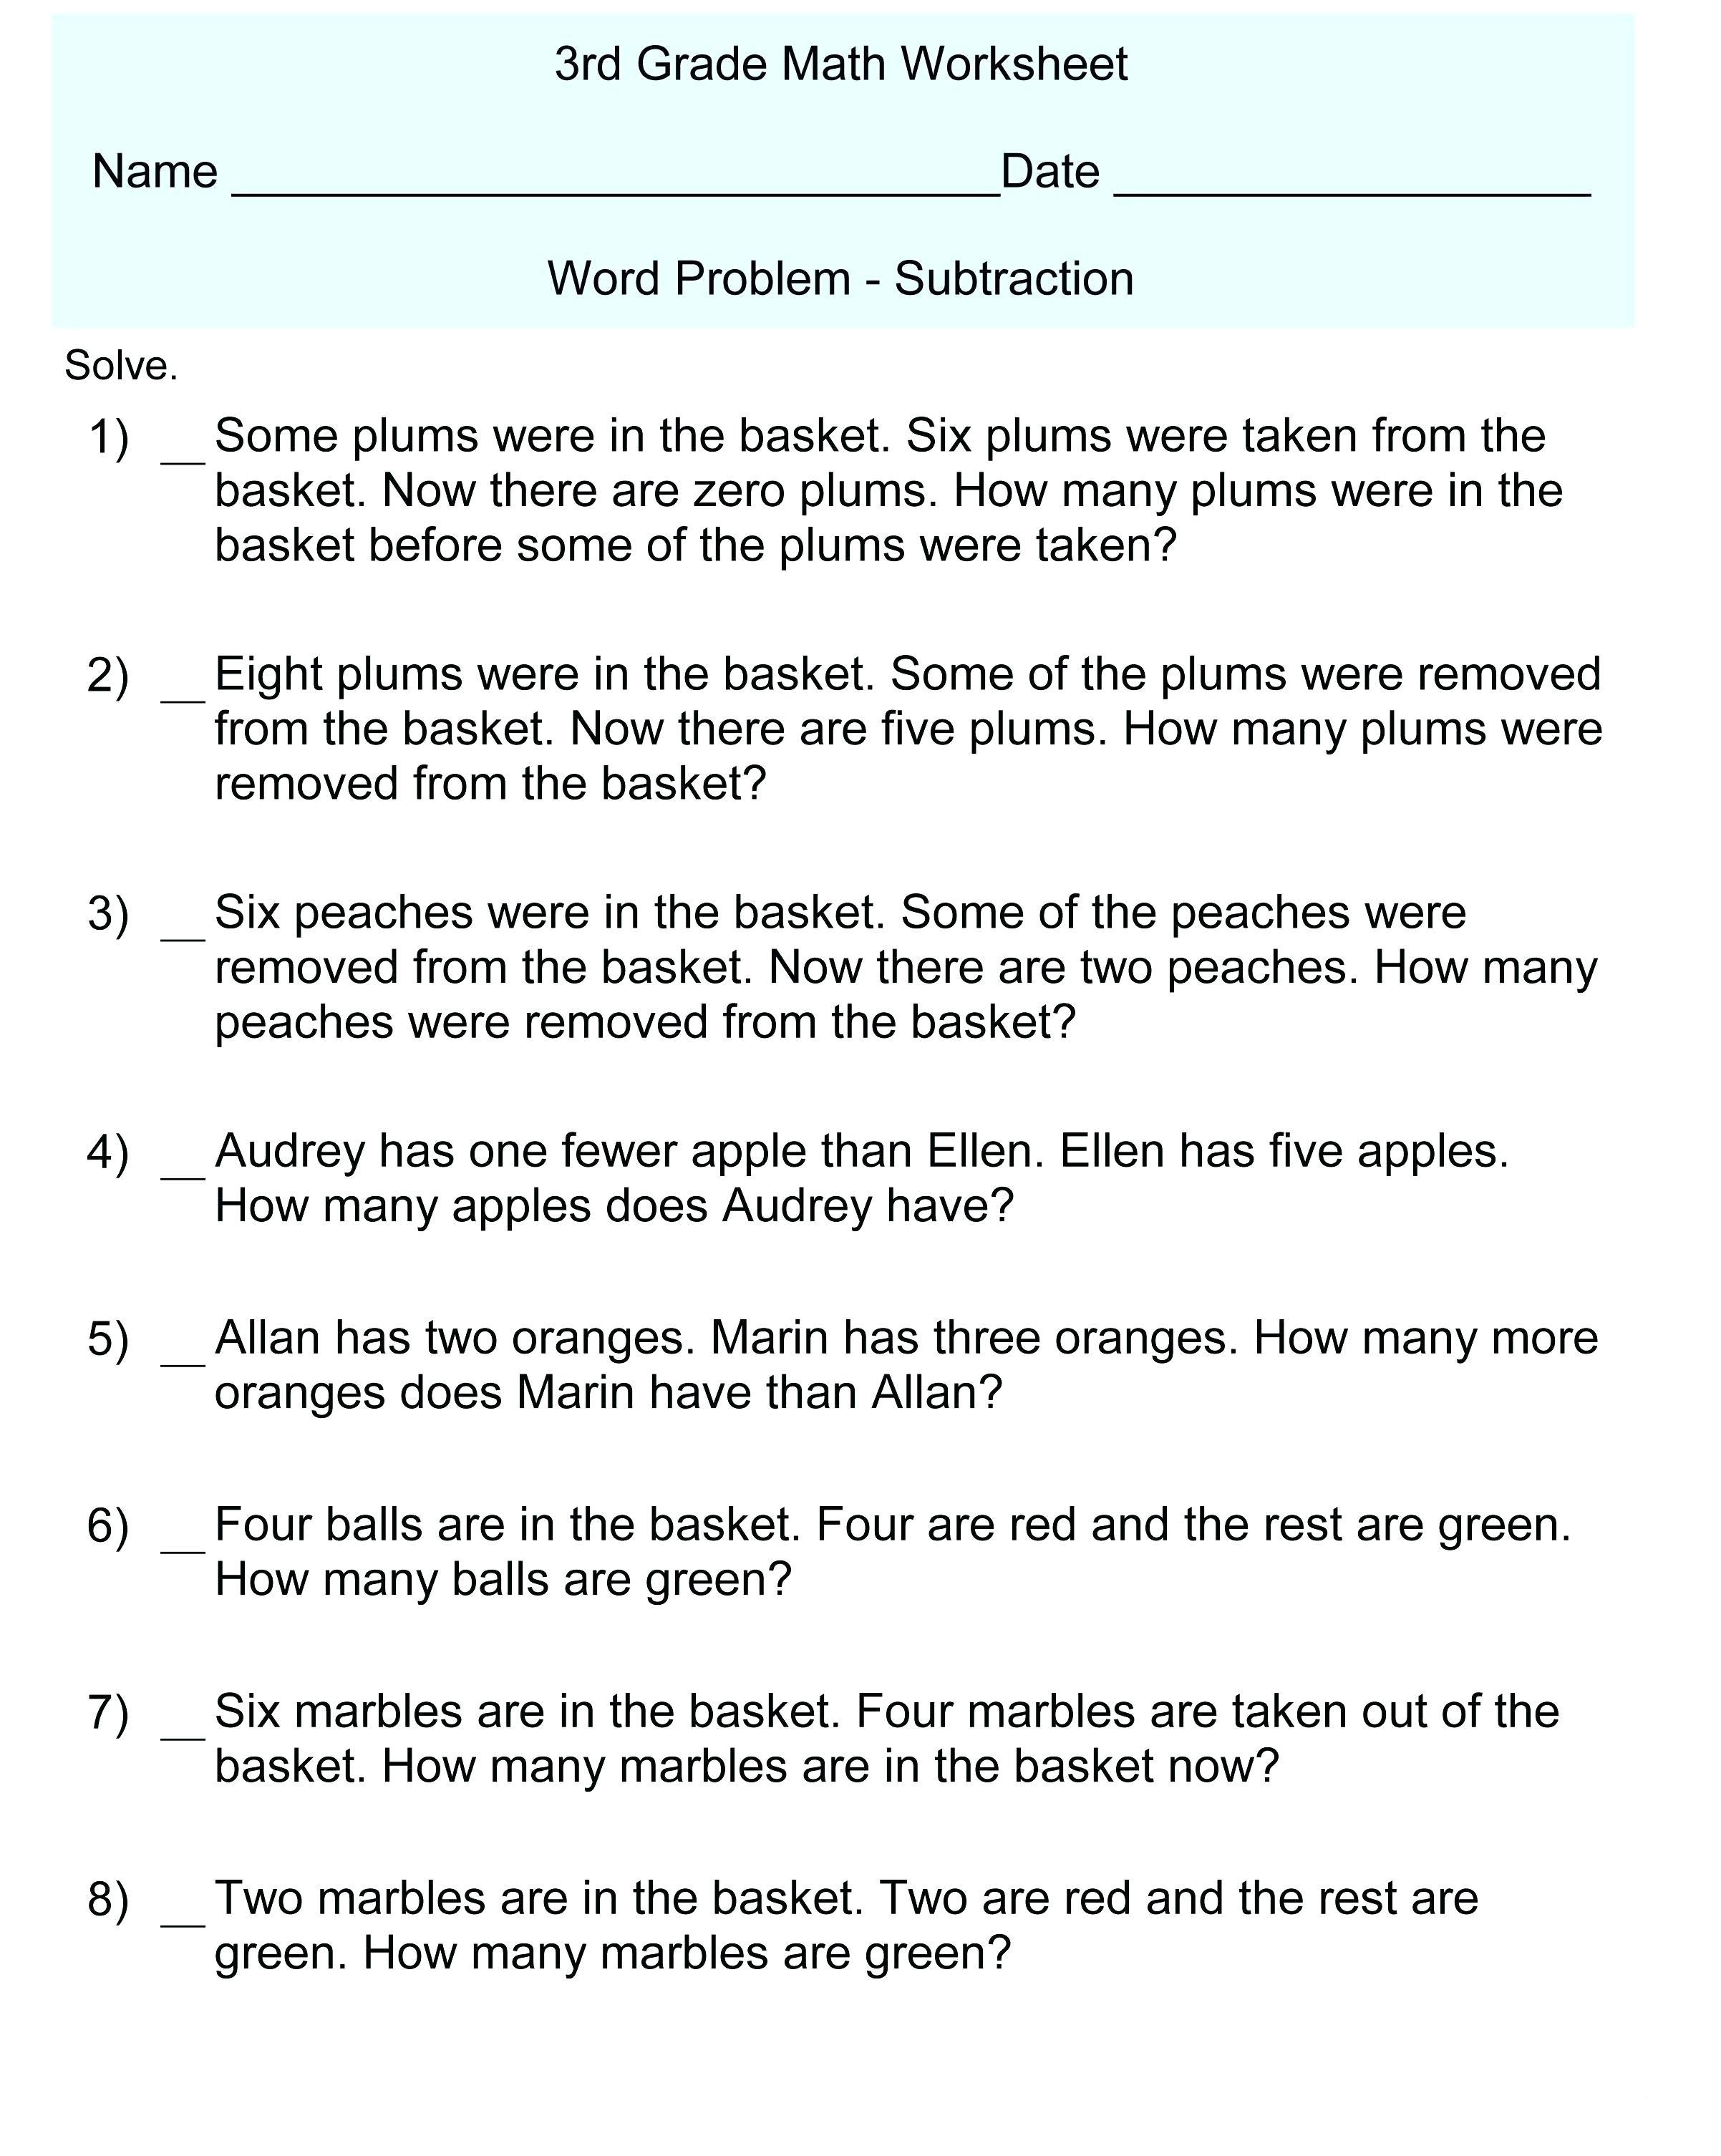 Math Worksheet 3rd Grade Printable